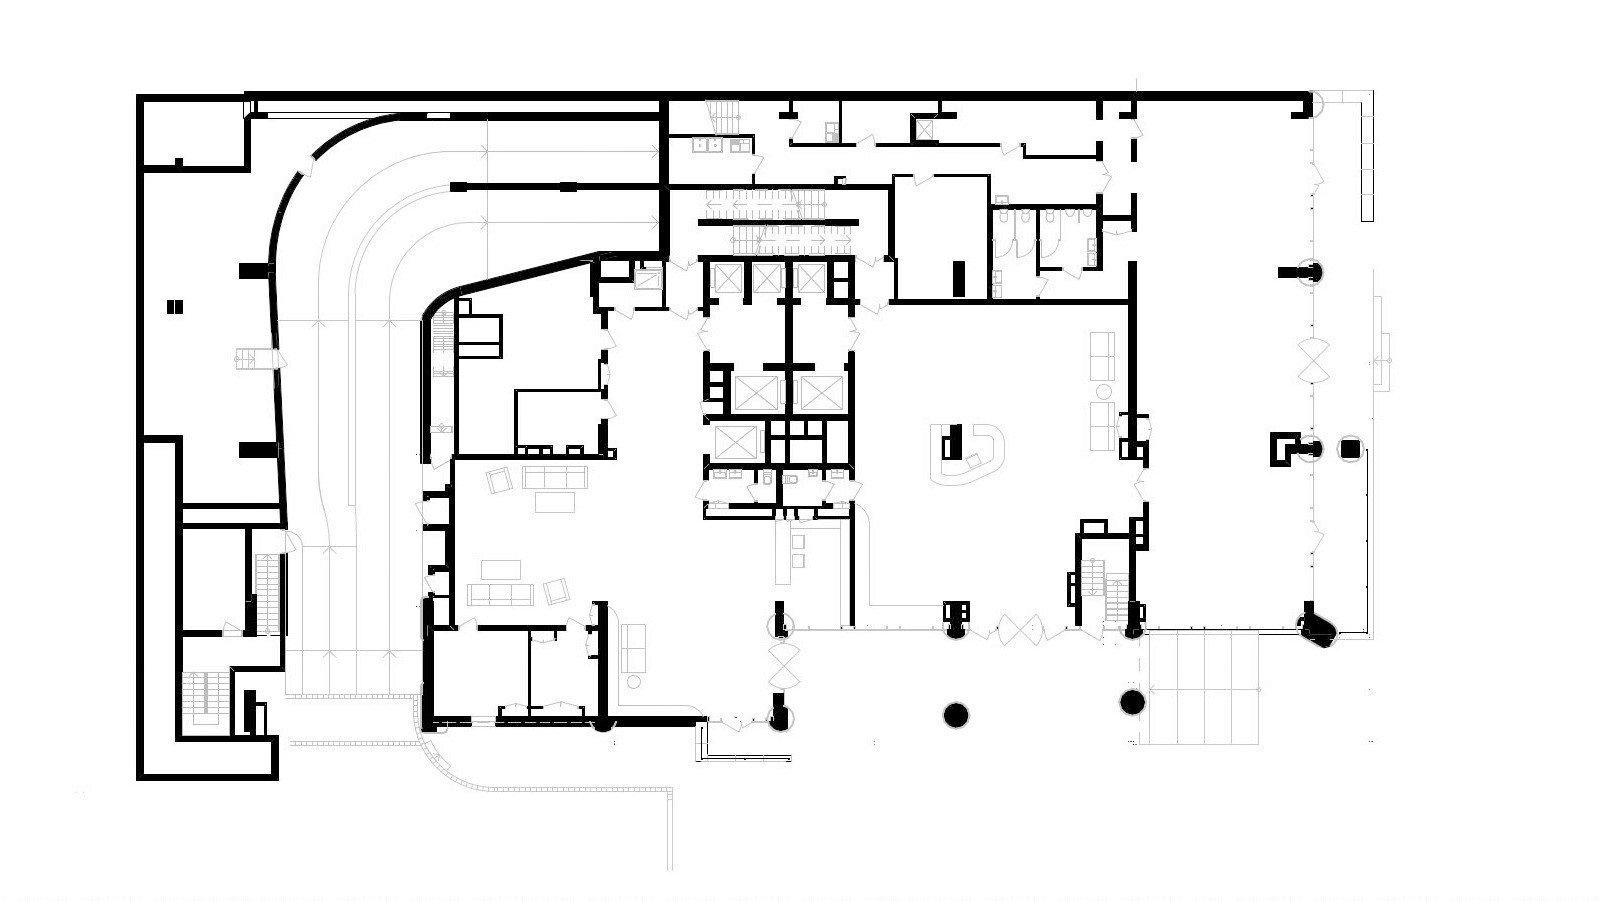 image-1-0: 116_shevchenka-interiors